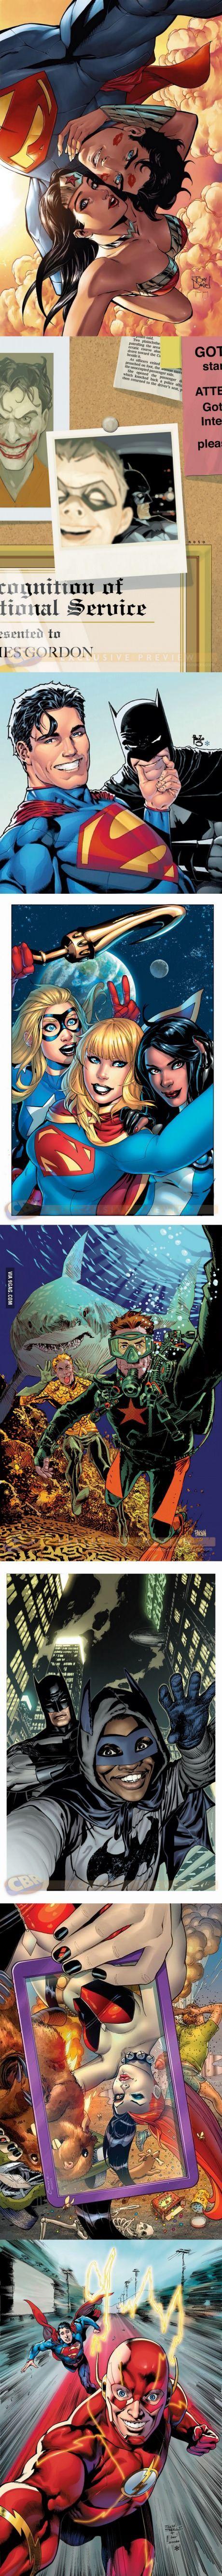 ¿Les gustan las ilustraciones y los comics? ¡Chequen esto chicos!!   Gotta save the world! But first...lemme take a selfie